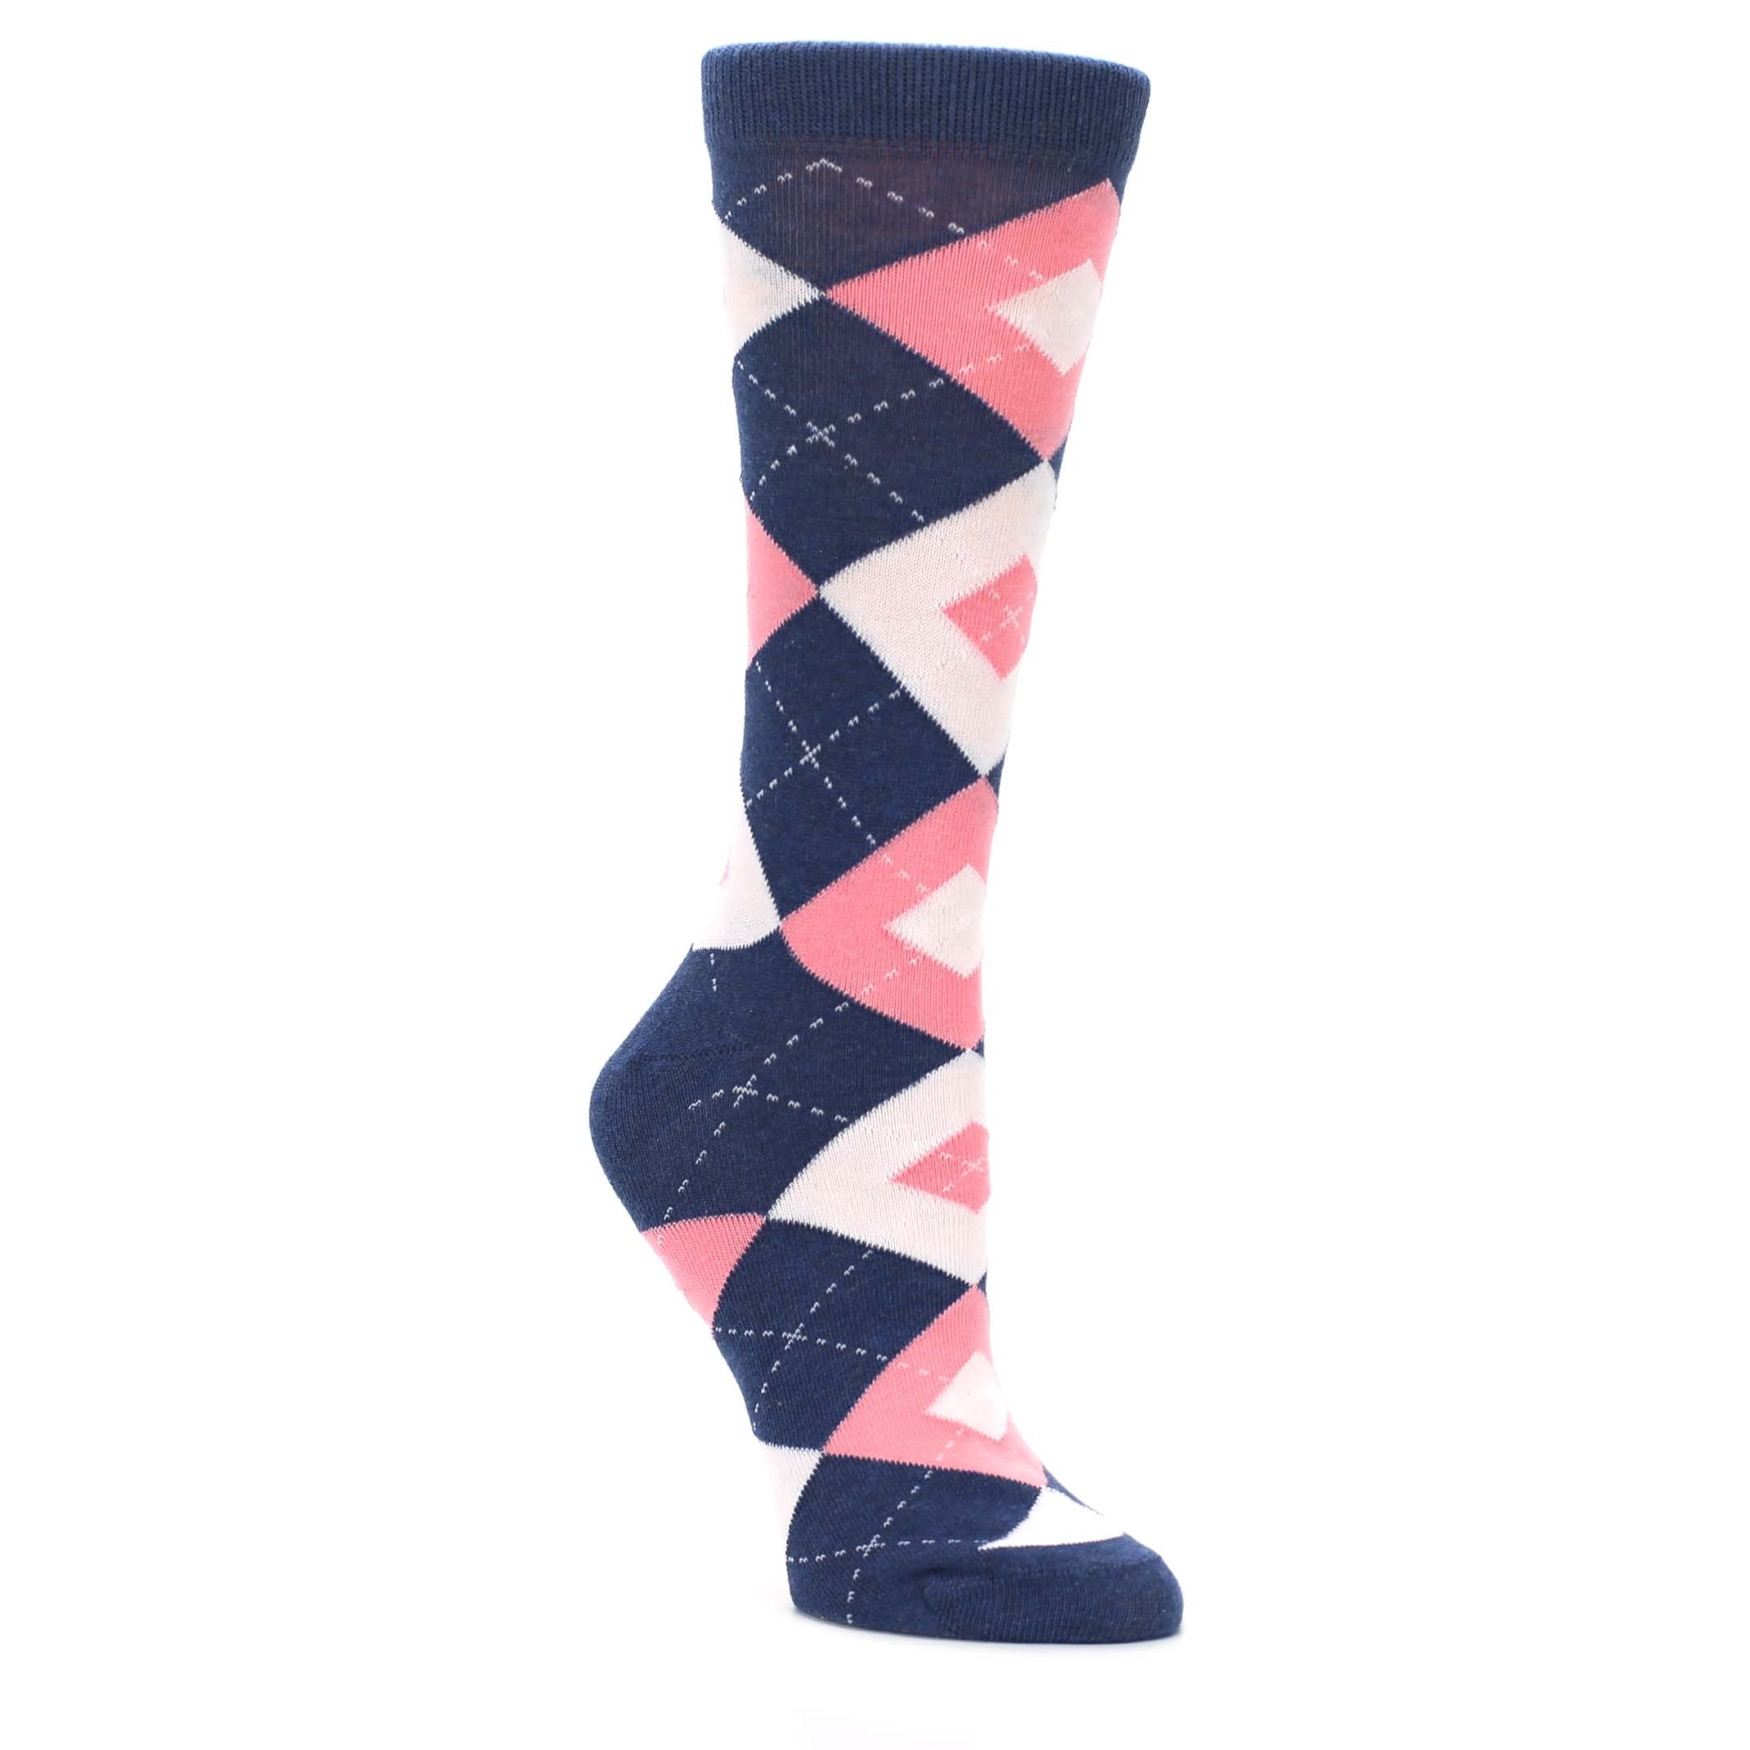 347c5a48c2a0 Flamingo Petal Pink Navy Argyle Women's Dress Socks - Statement Sockwear